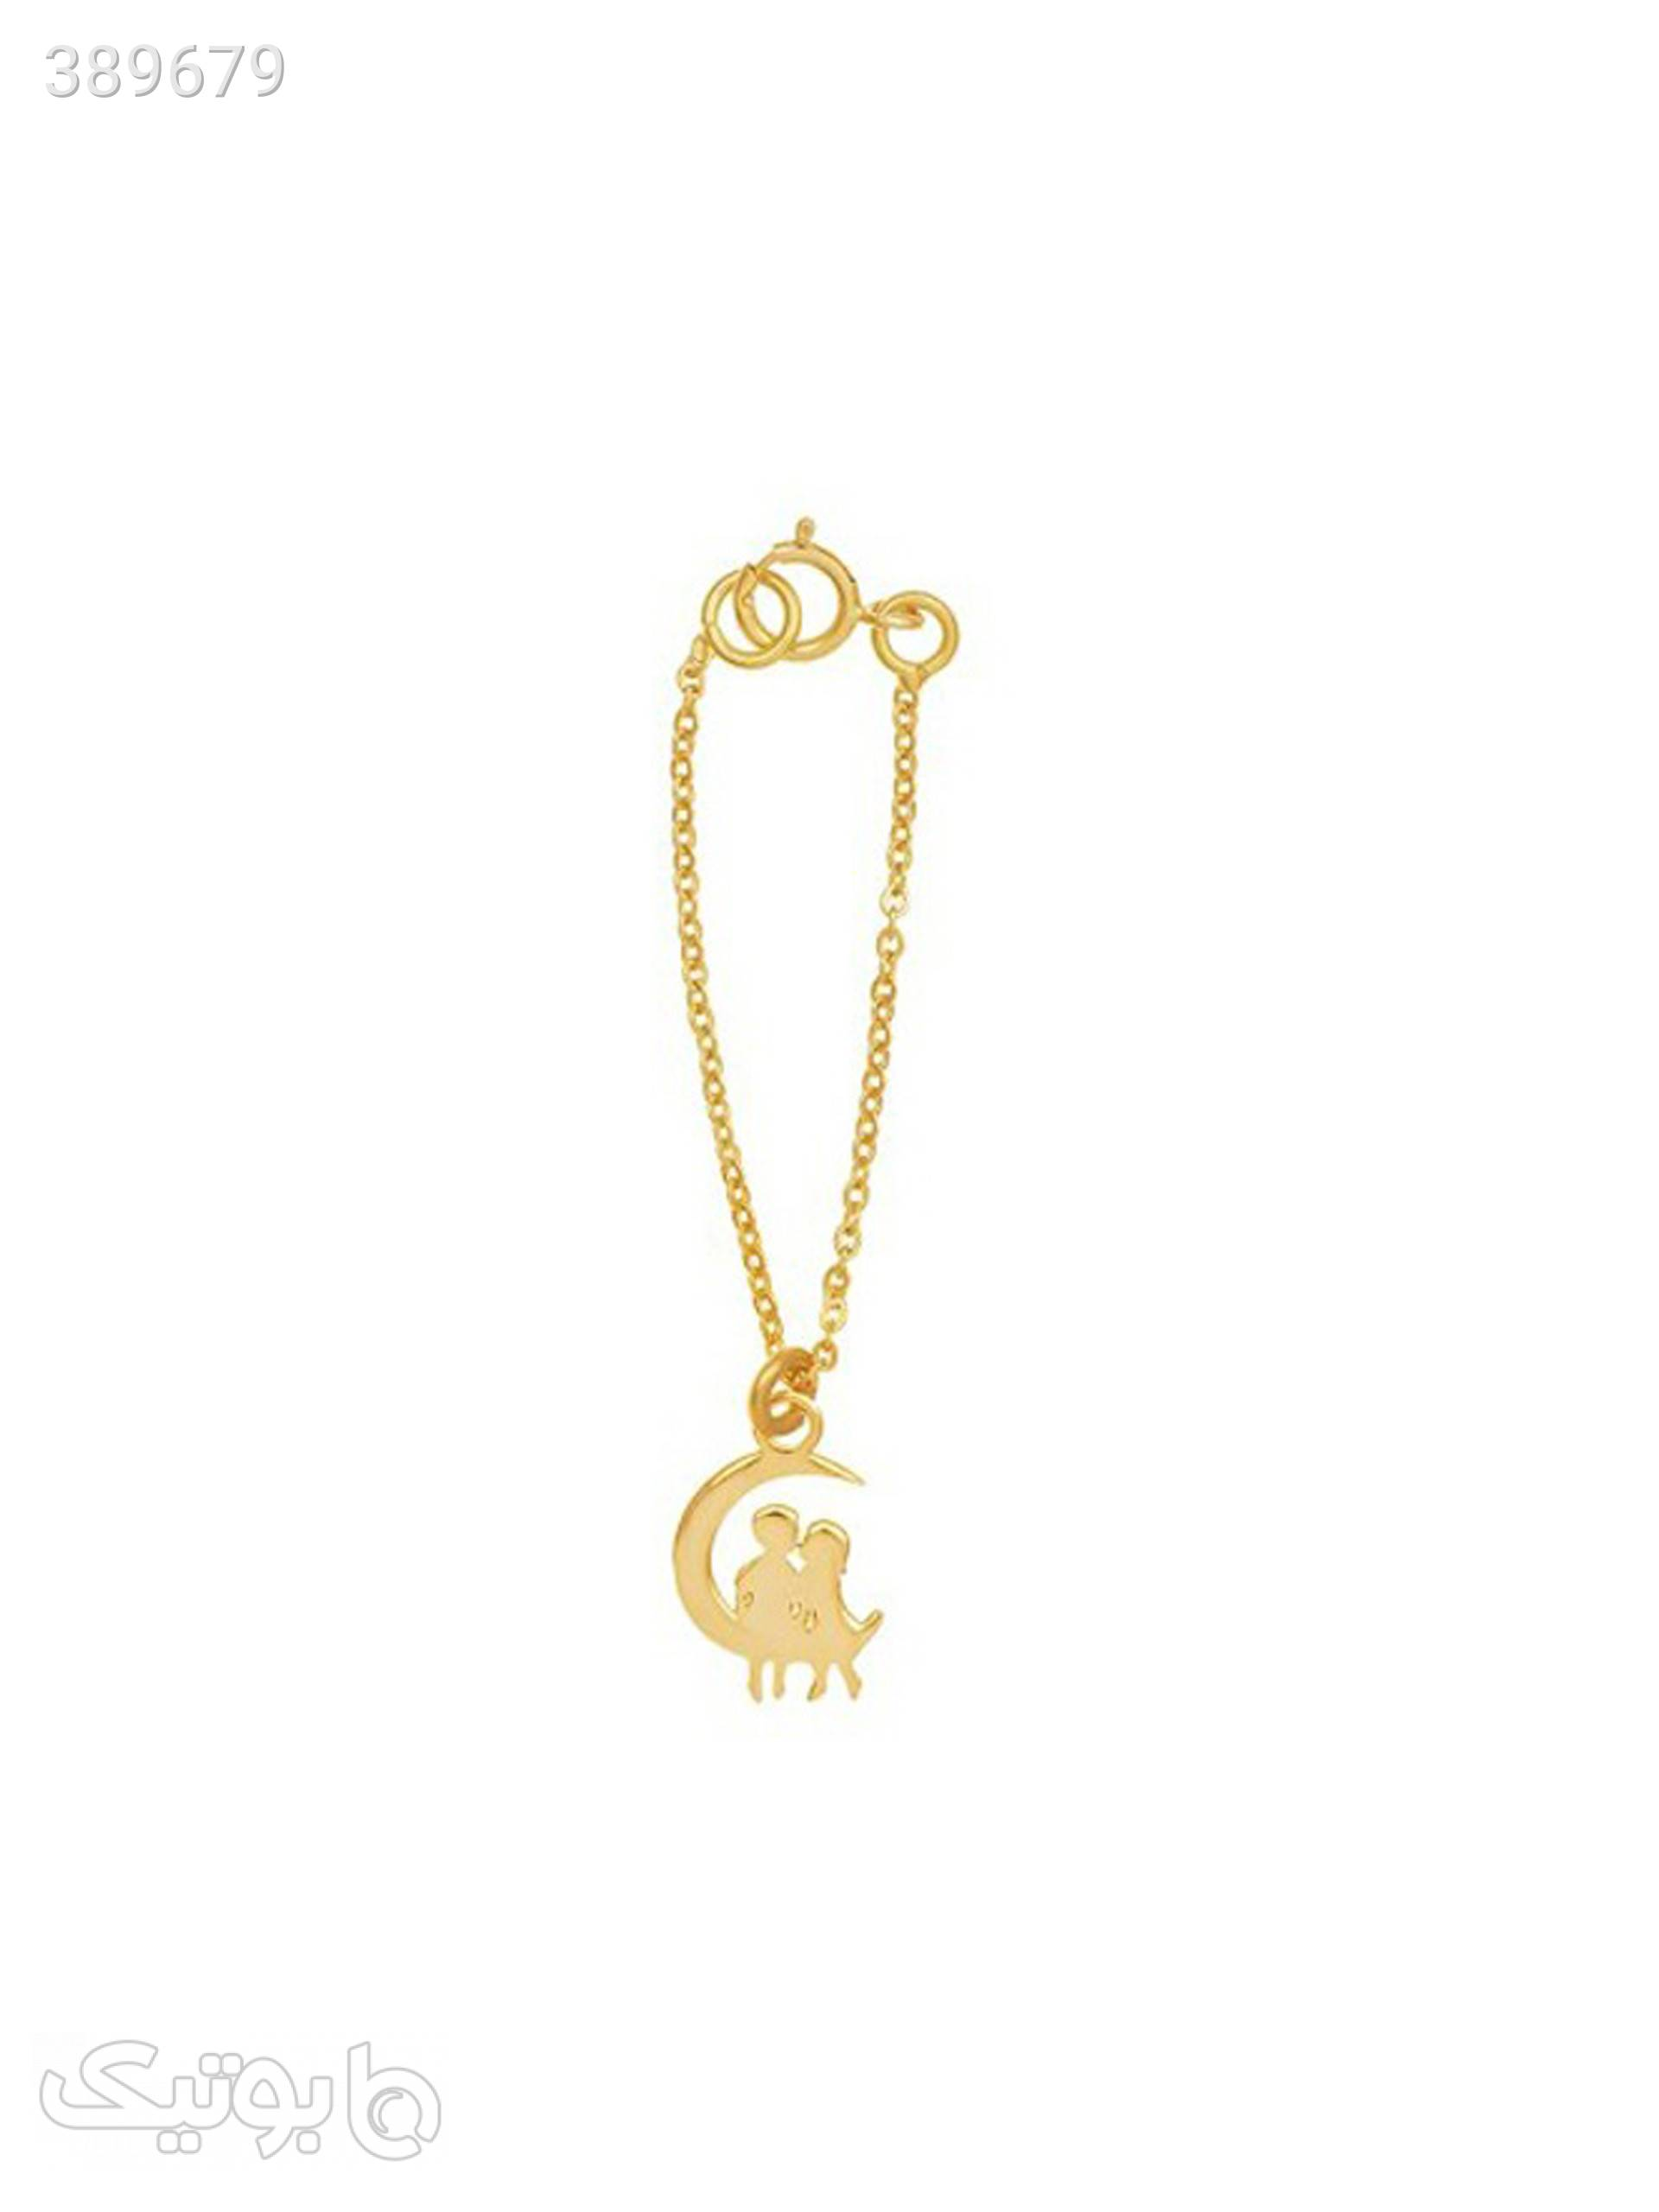 آویز ساعت طلا 18 عیار مدل WTC97  طلایی آویز ساعت